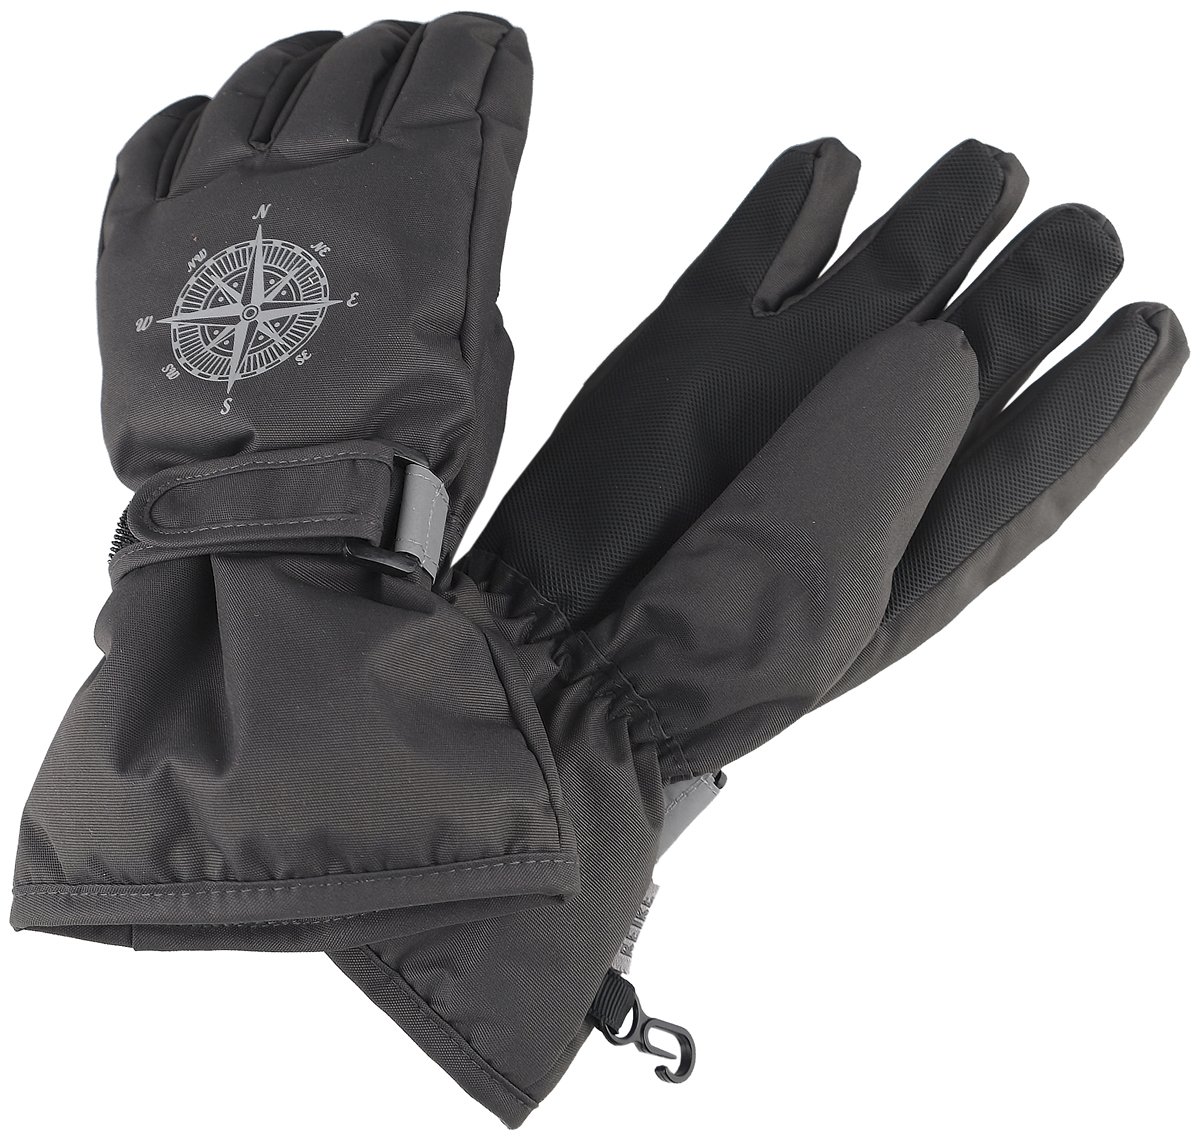 Перчатки для мальчика Reike, цвет: серый. RW18_MP grey. Размер 8 перчатки reike